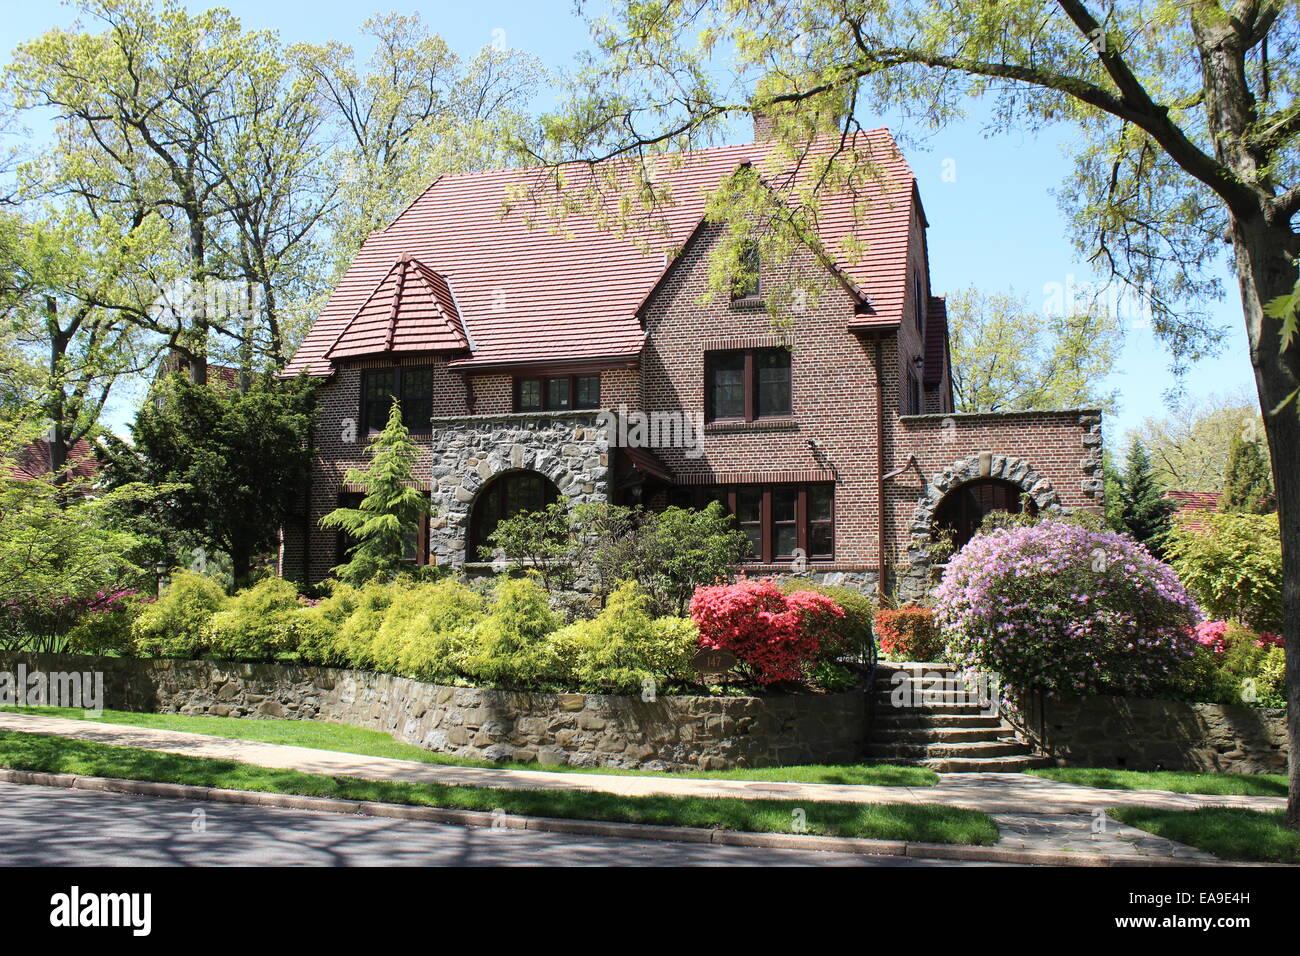 Tudor Revival House, Forest Hills Gardens, Queens, New York